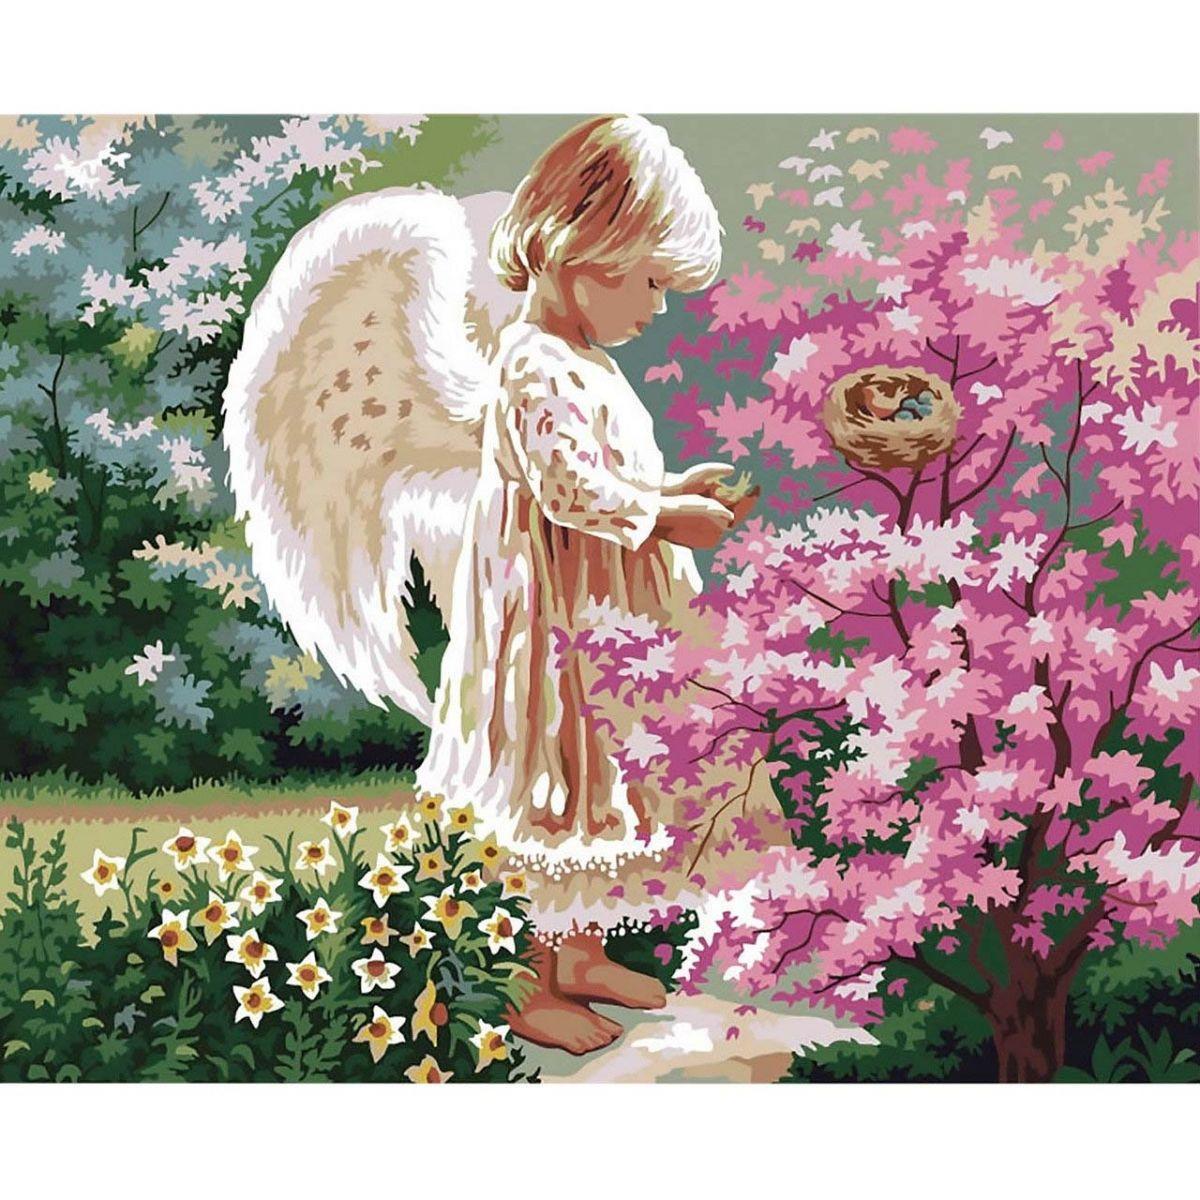 Картина по номерам Ангелочек и птички КНО1048